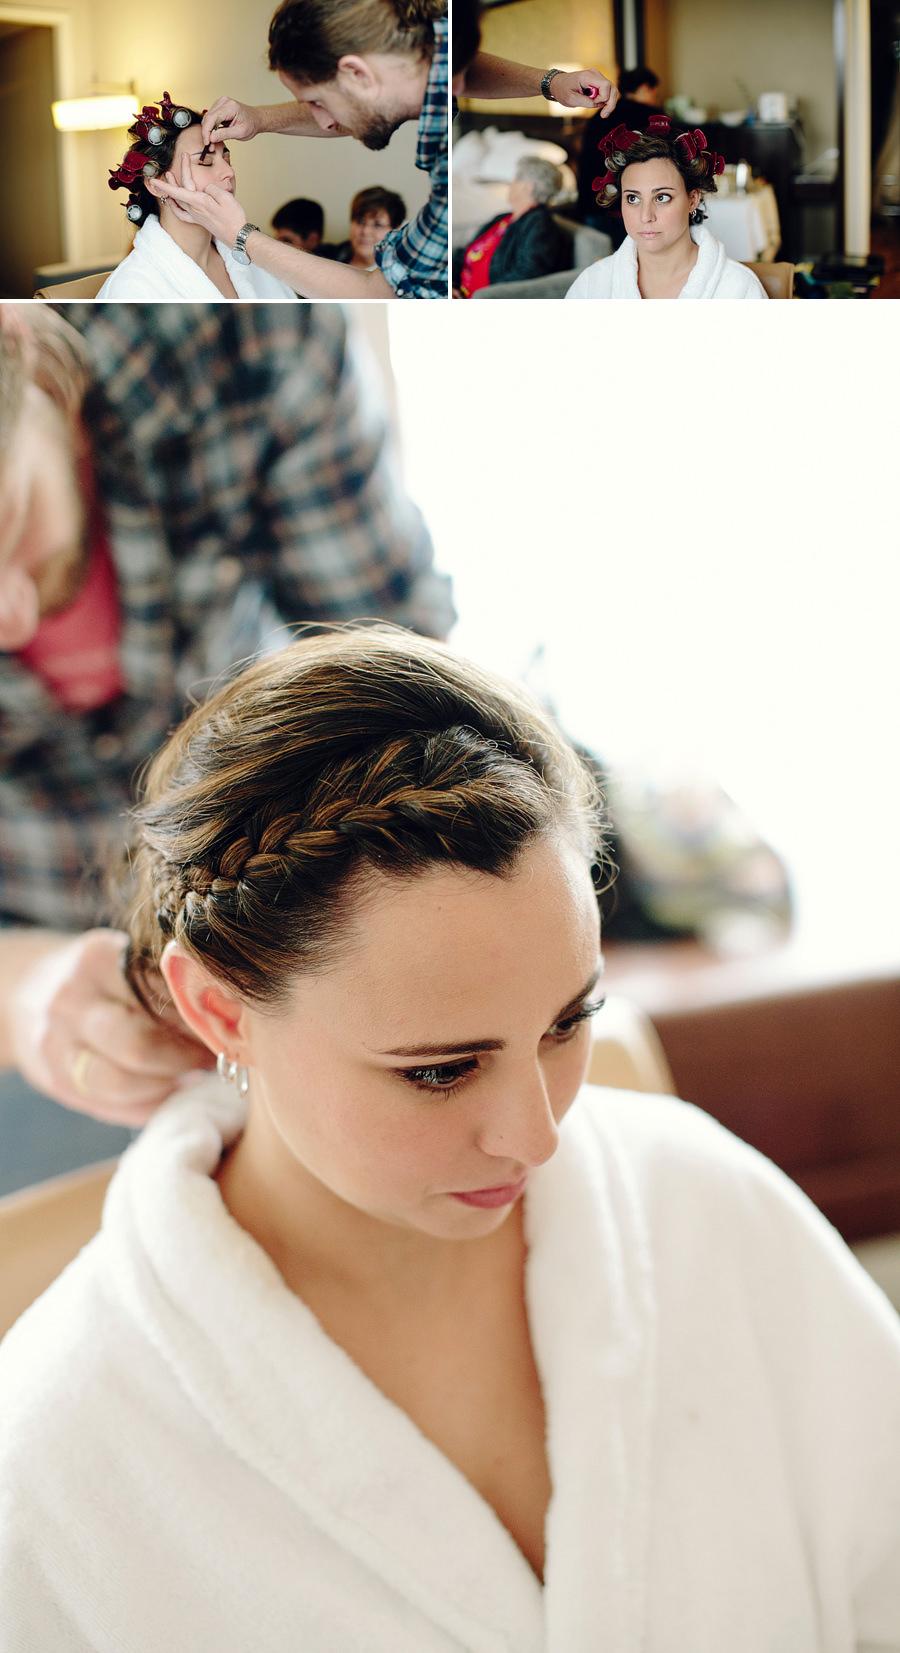 Shangri La Wedding Photography: Bride having hair done